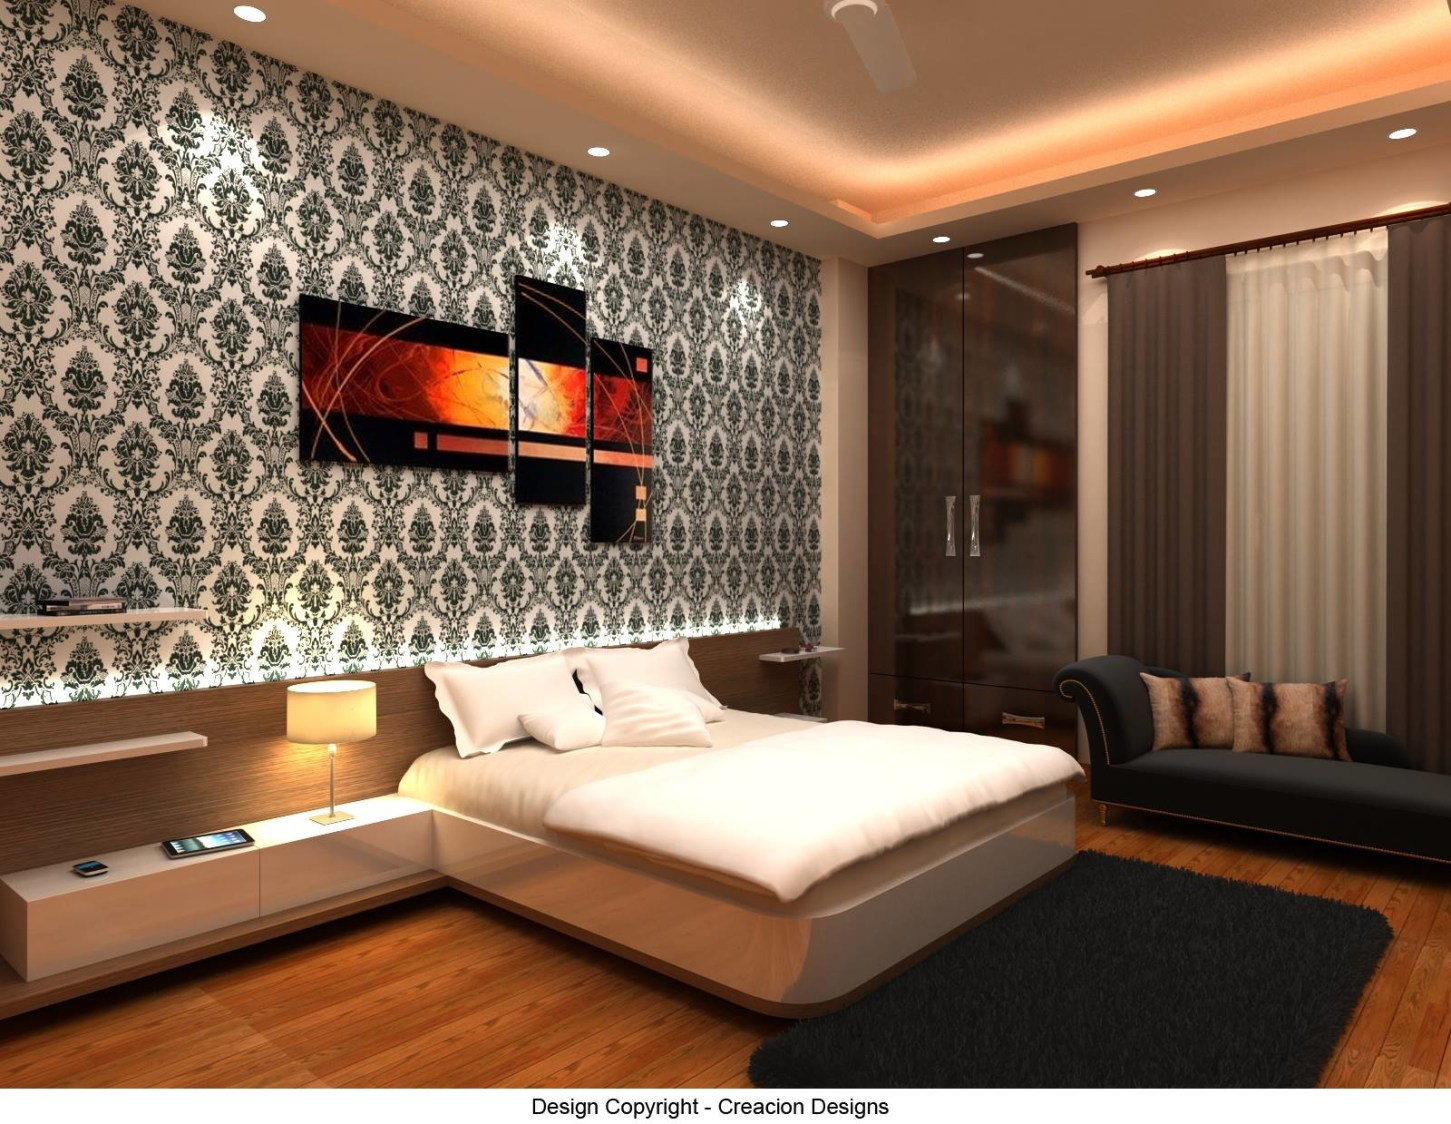 Bedroom With Modern Wall Art by Deepanshu Prasad Bedroom Contemporary | Interior Design Photos & Ideas